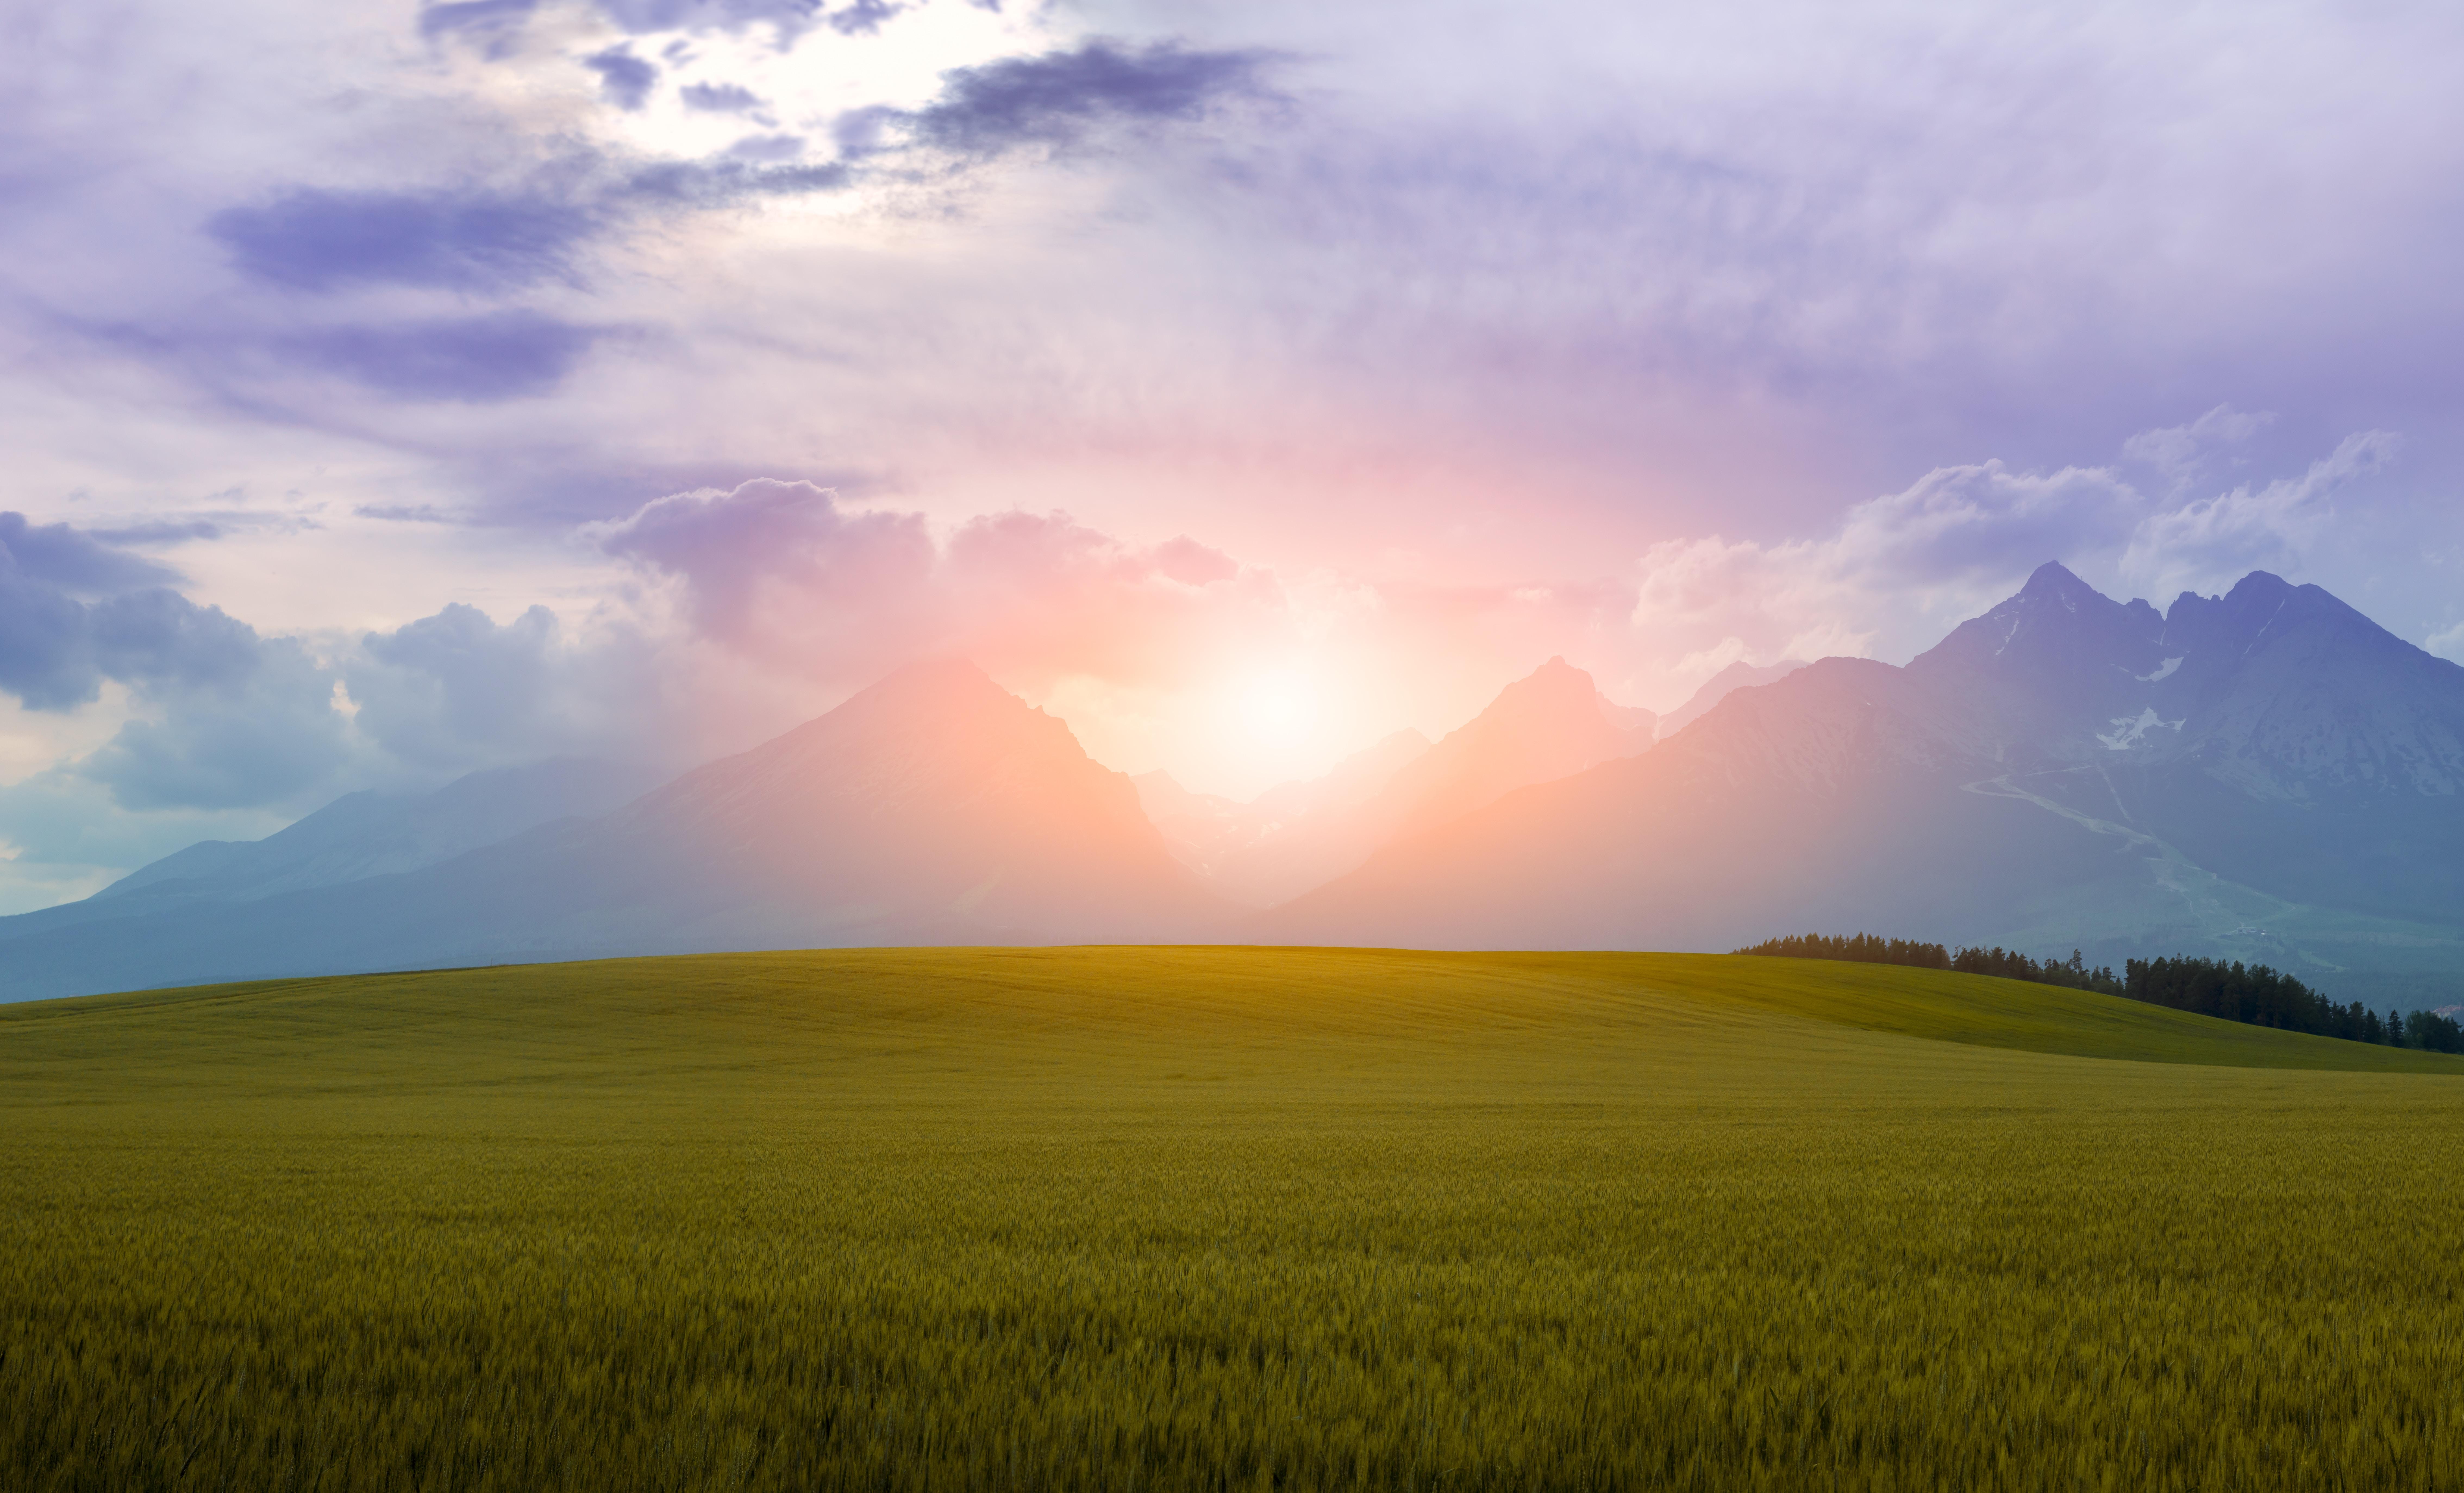 green grass field near mountains under cloudy sky during daytime